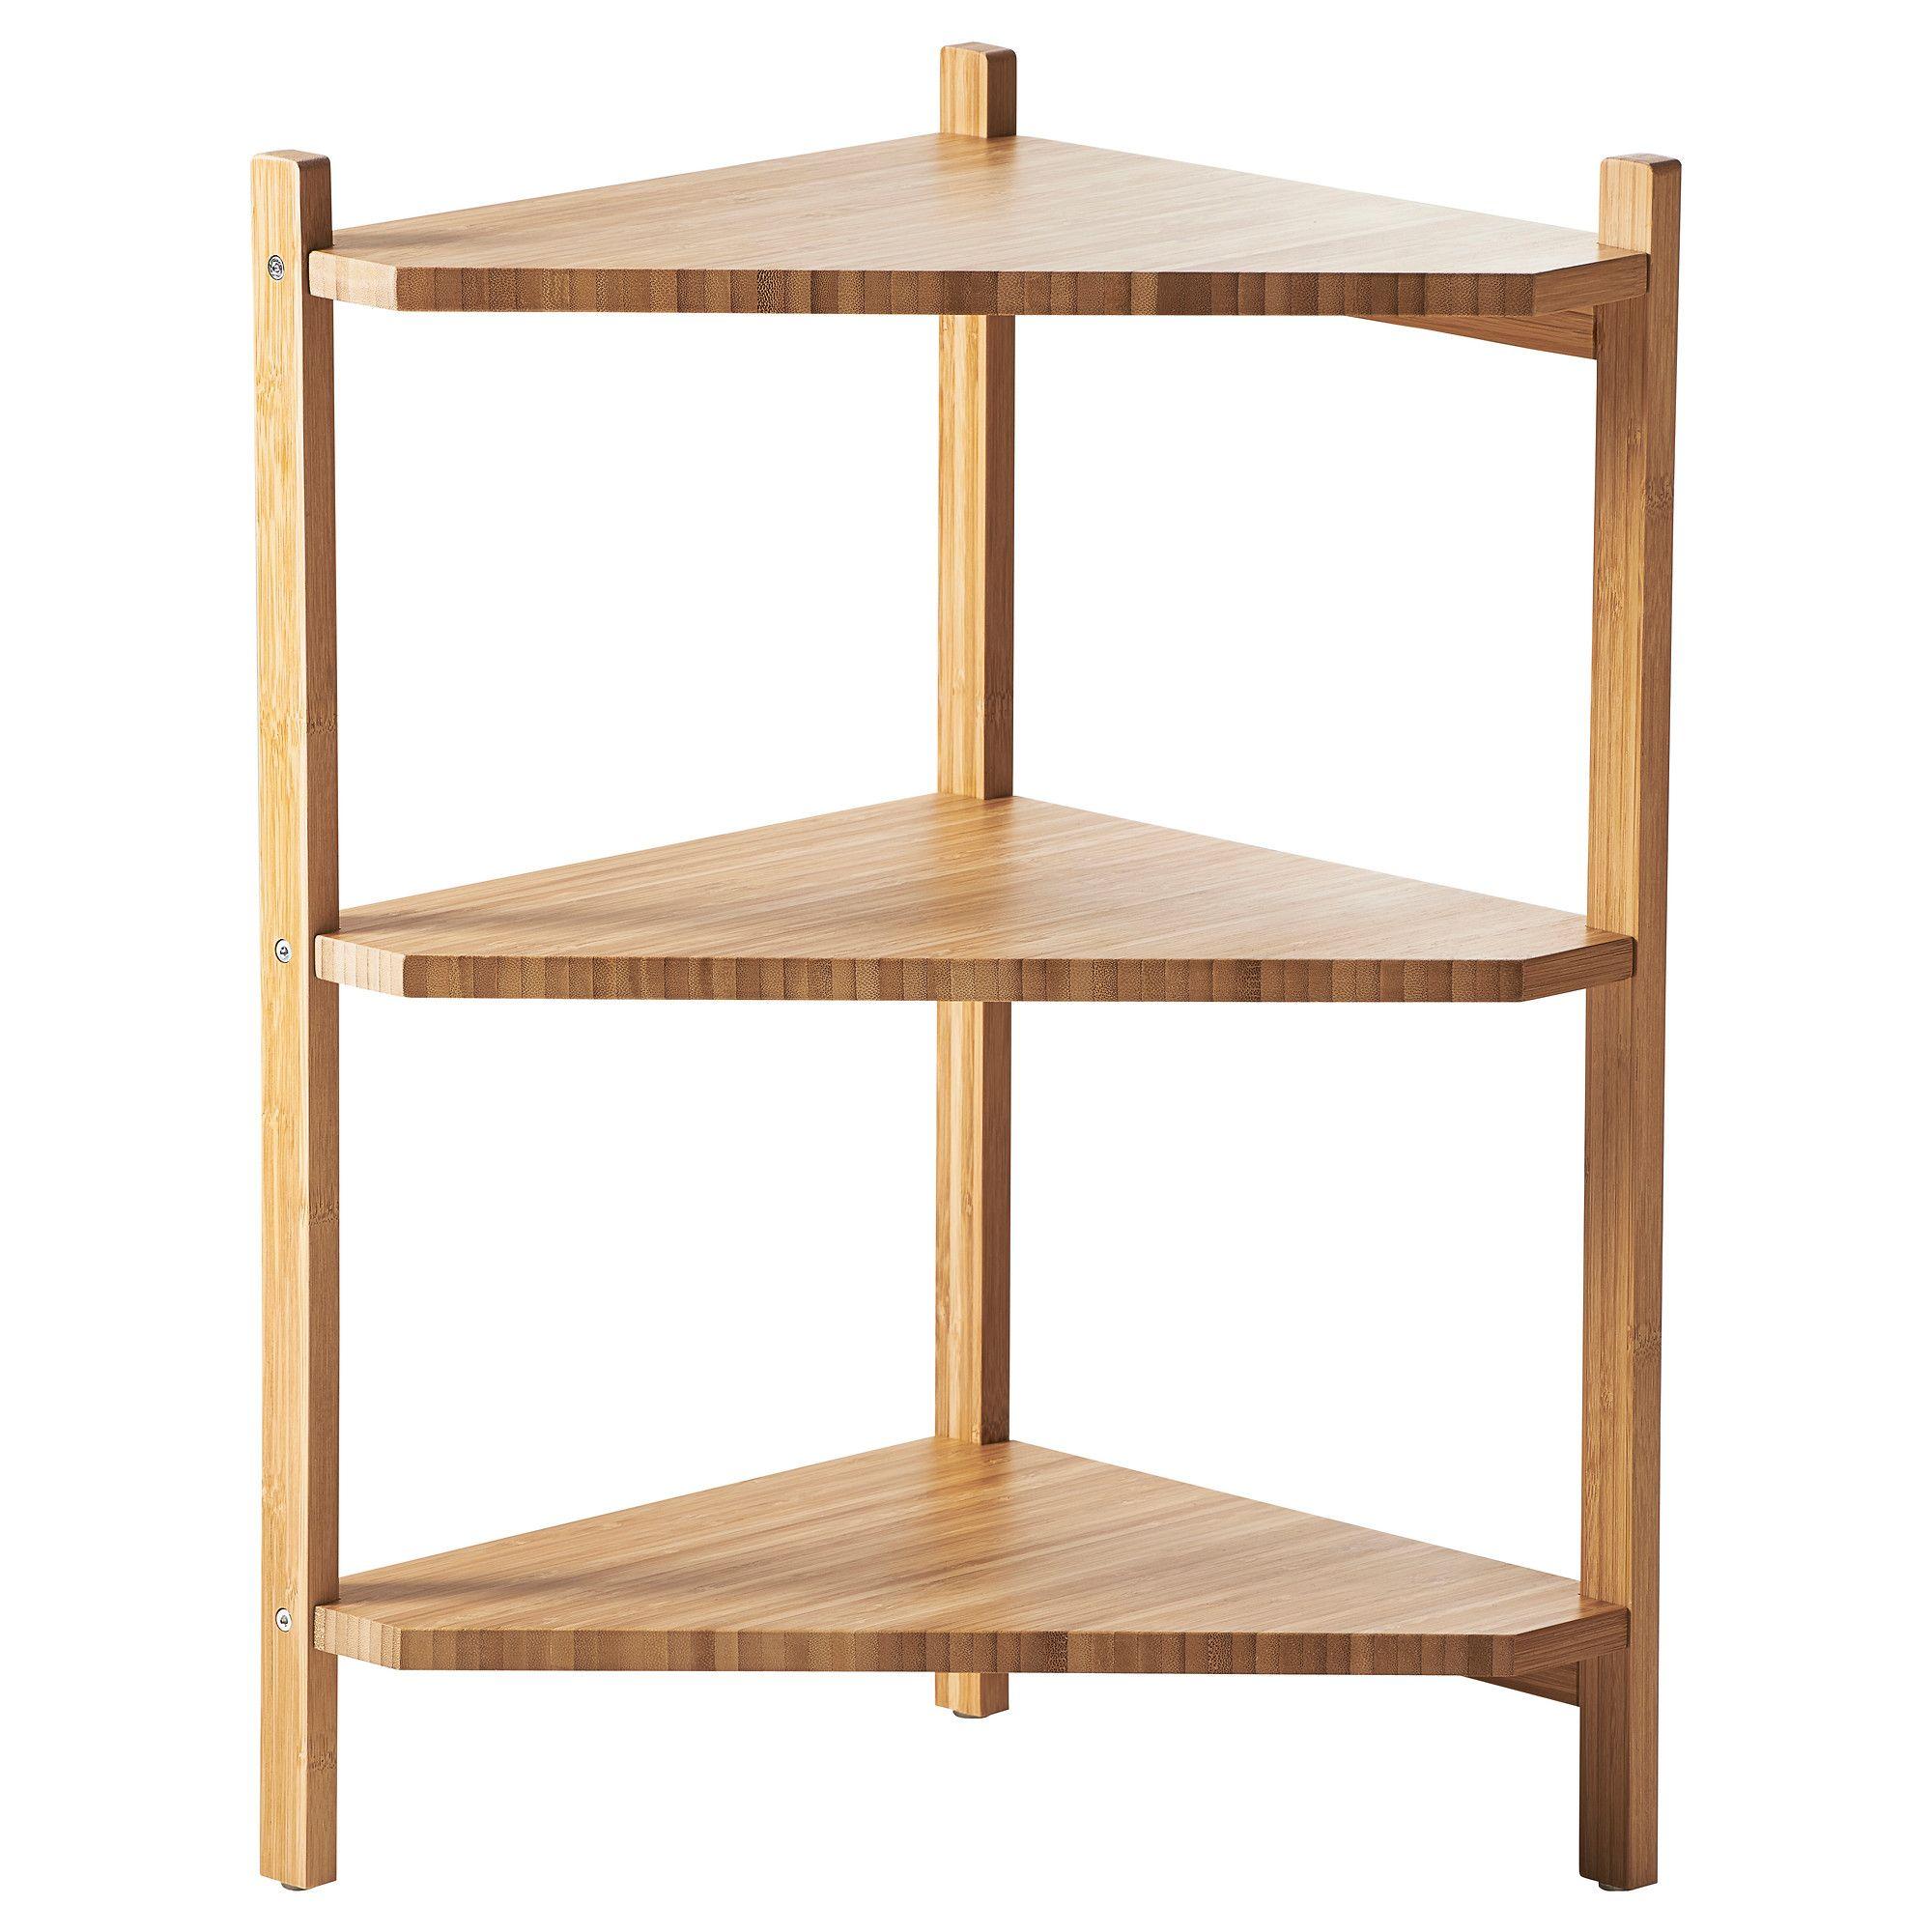 Ragrund Sink Shelf Corner Shelf Bamboo 13 3 8x23 5 8 Eckregal Ikea Eckregal Eckregale